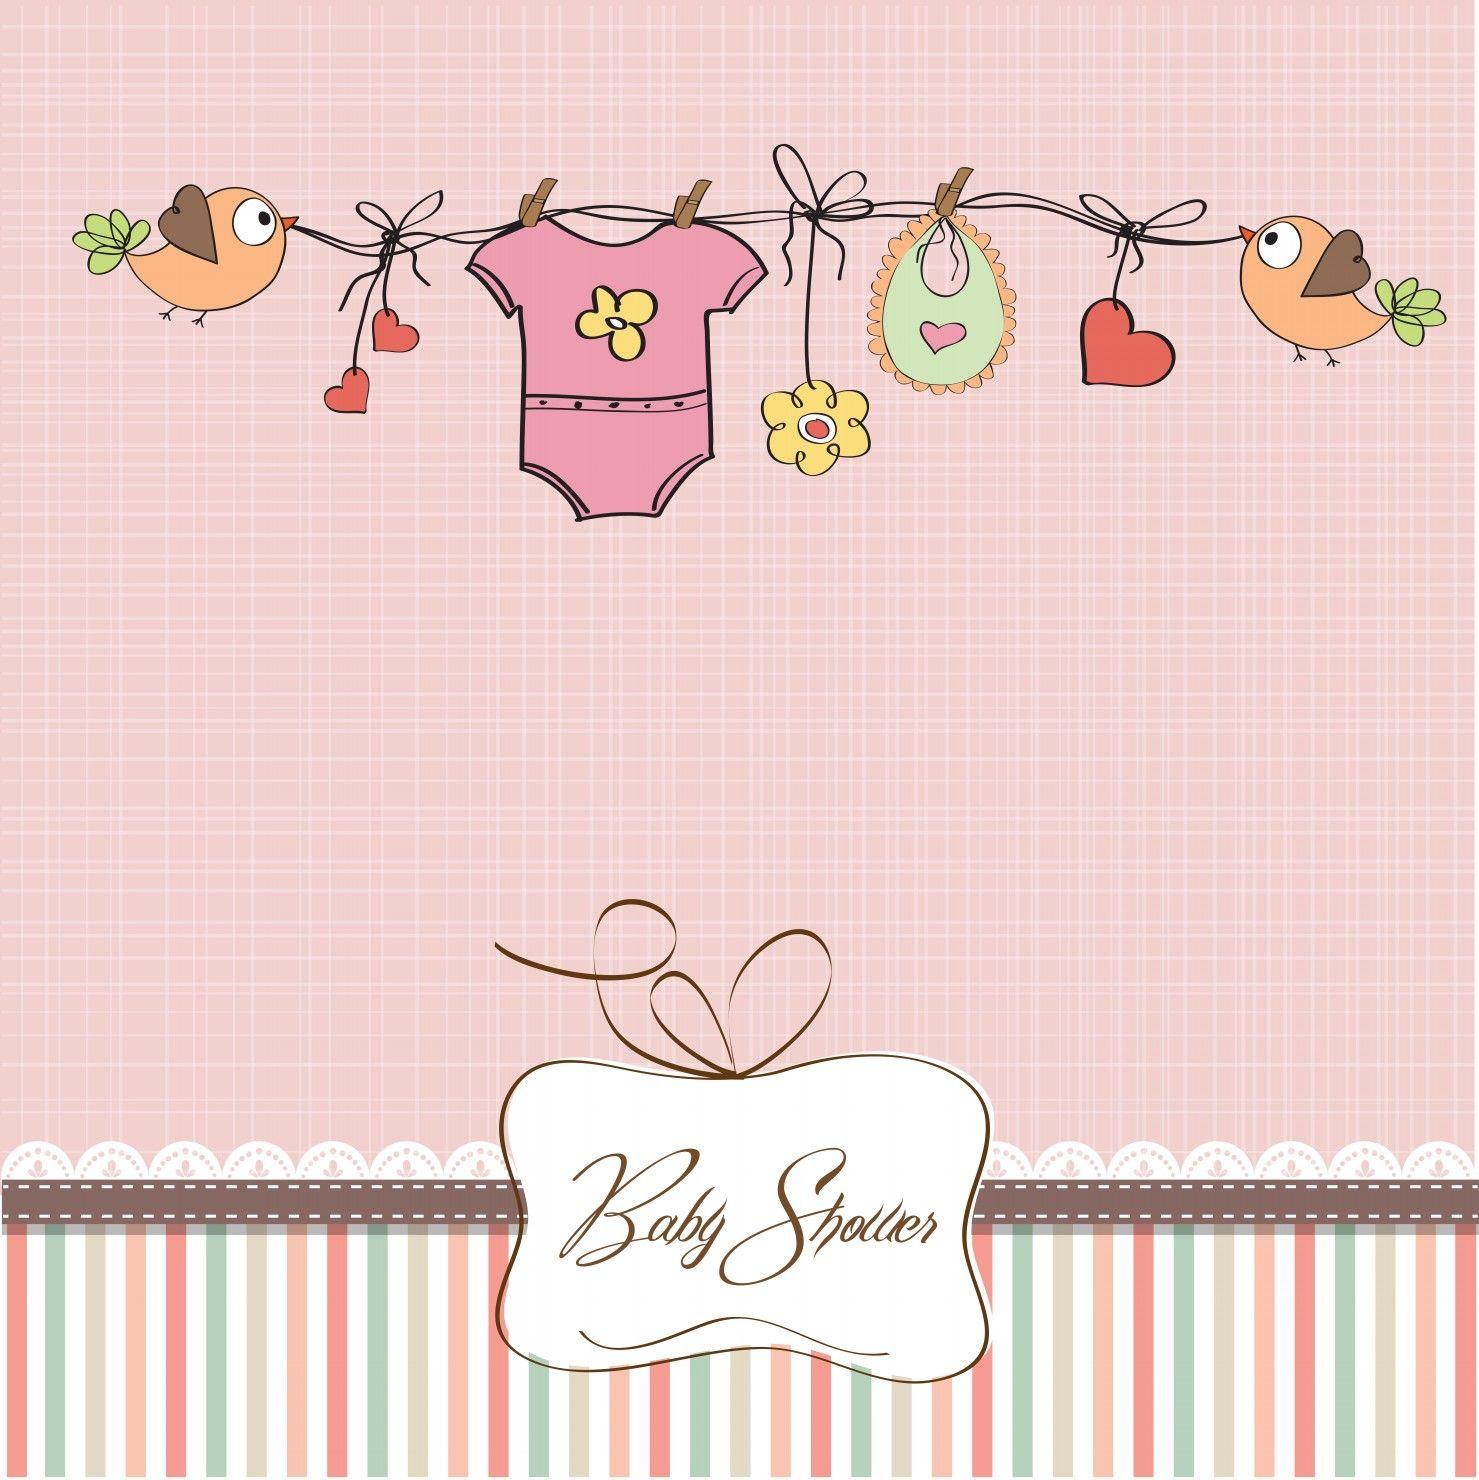 Baby shower cards imprimibles baby shower tarjetas de